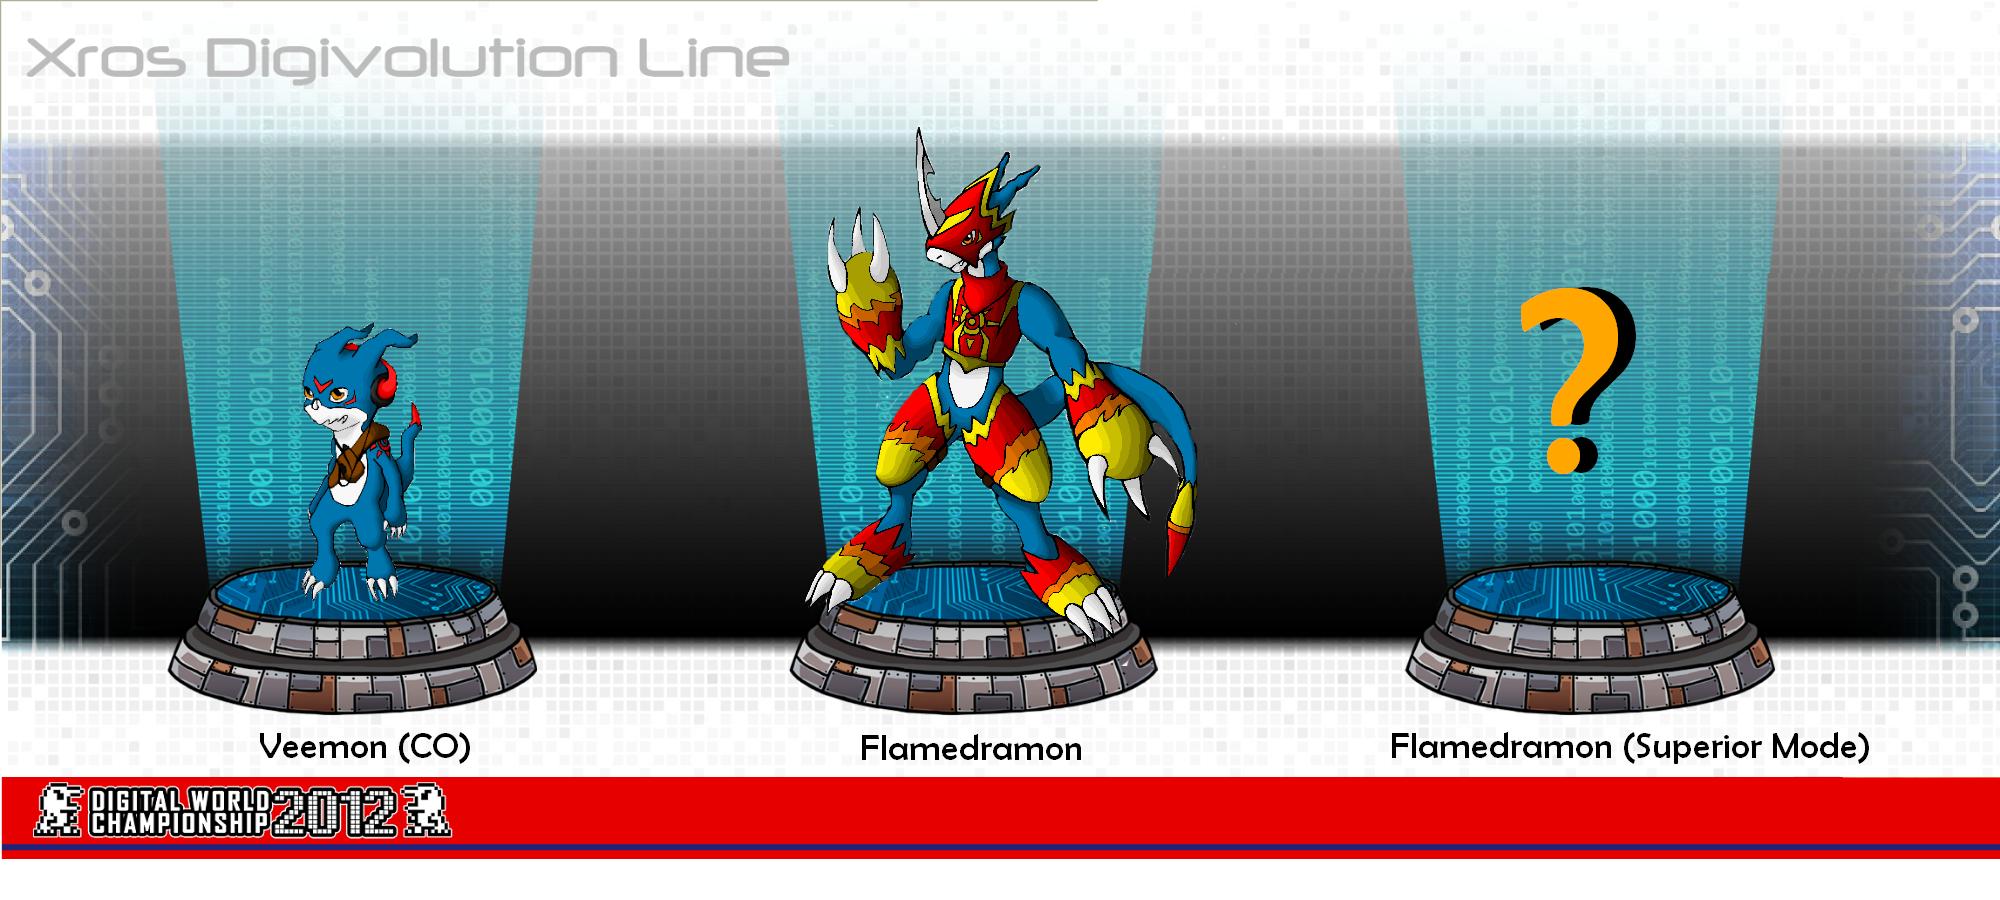 Flamedramon evolution